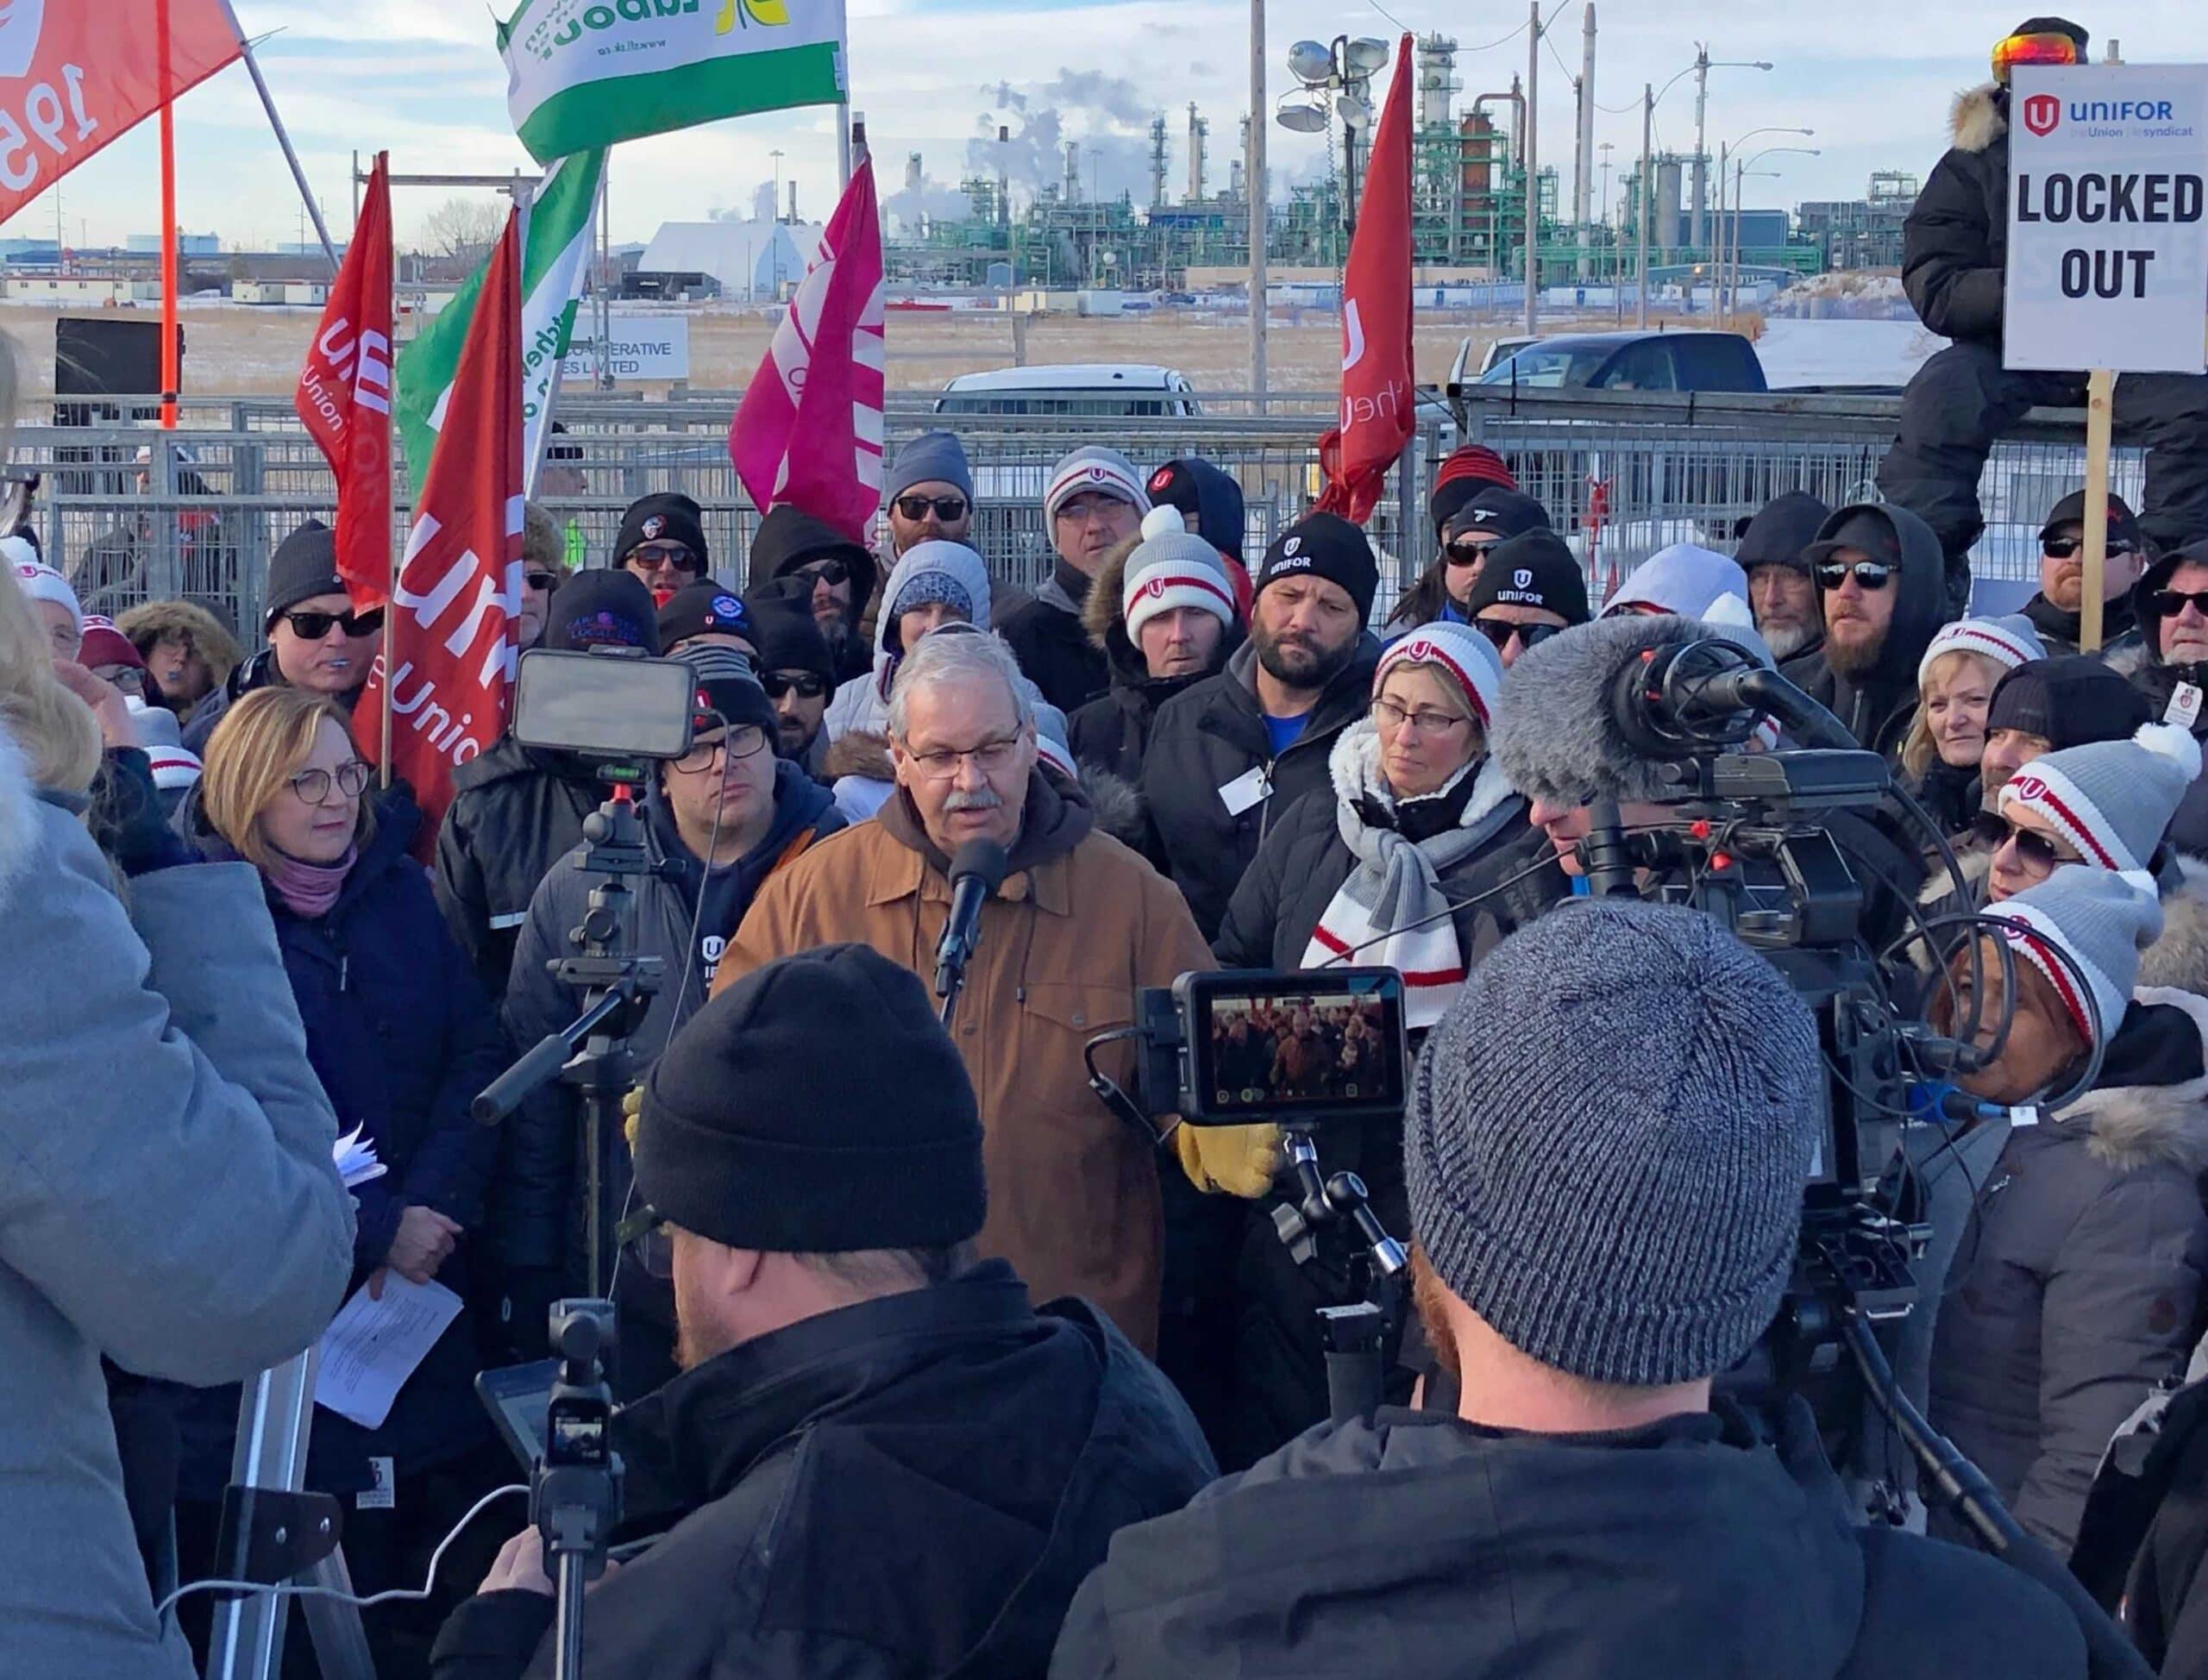 Thomas at Unifor rally in Regina